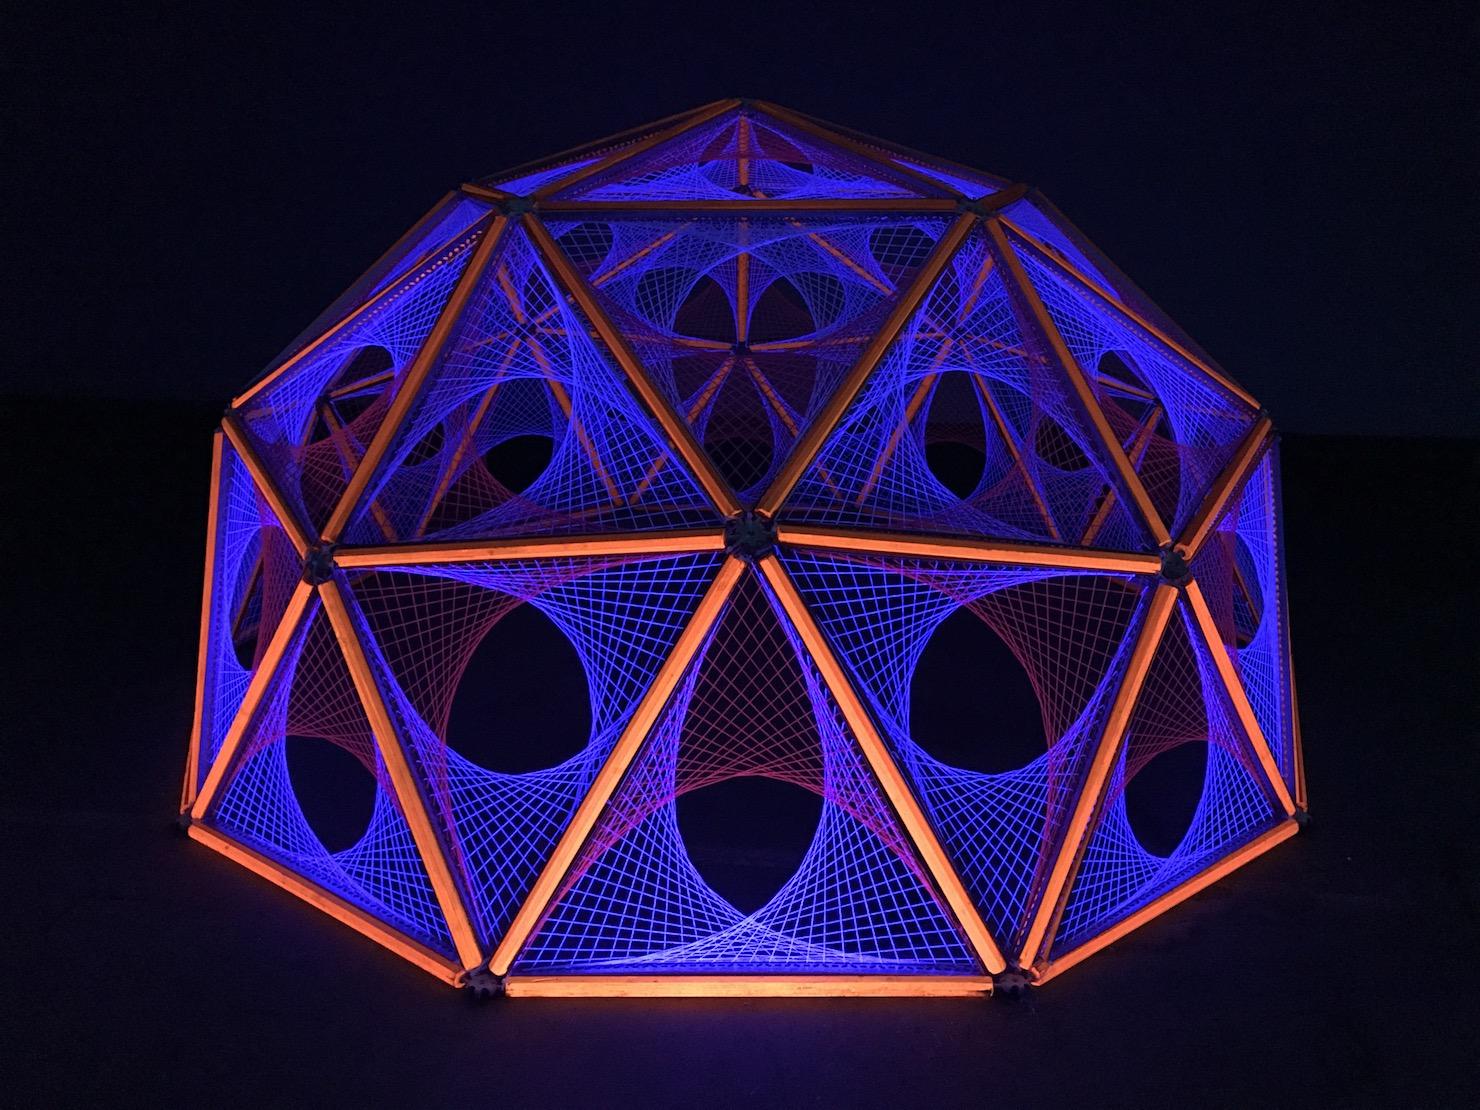 2-light-sculpture-art-ultra-violet-black-parabola-hubs-dome-geodesic.jpg